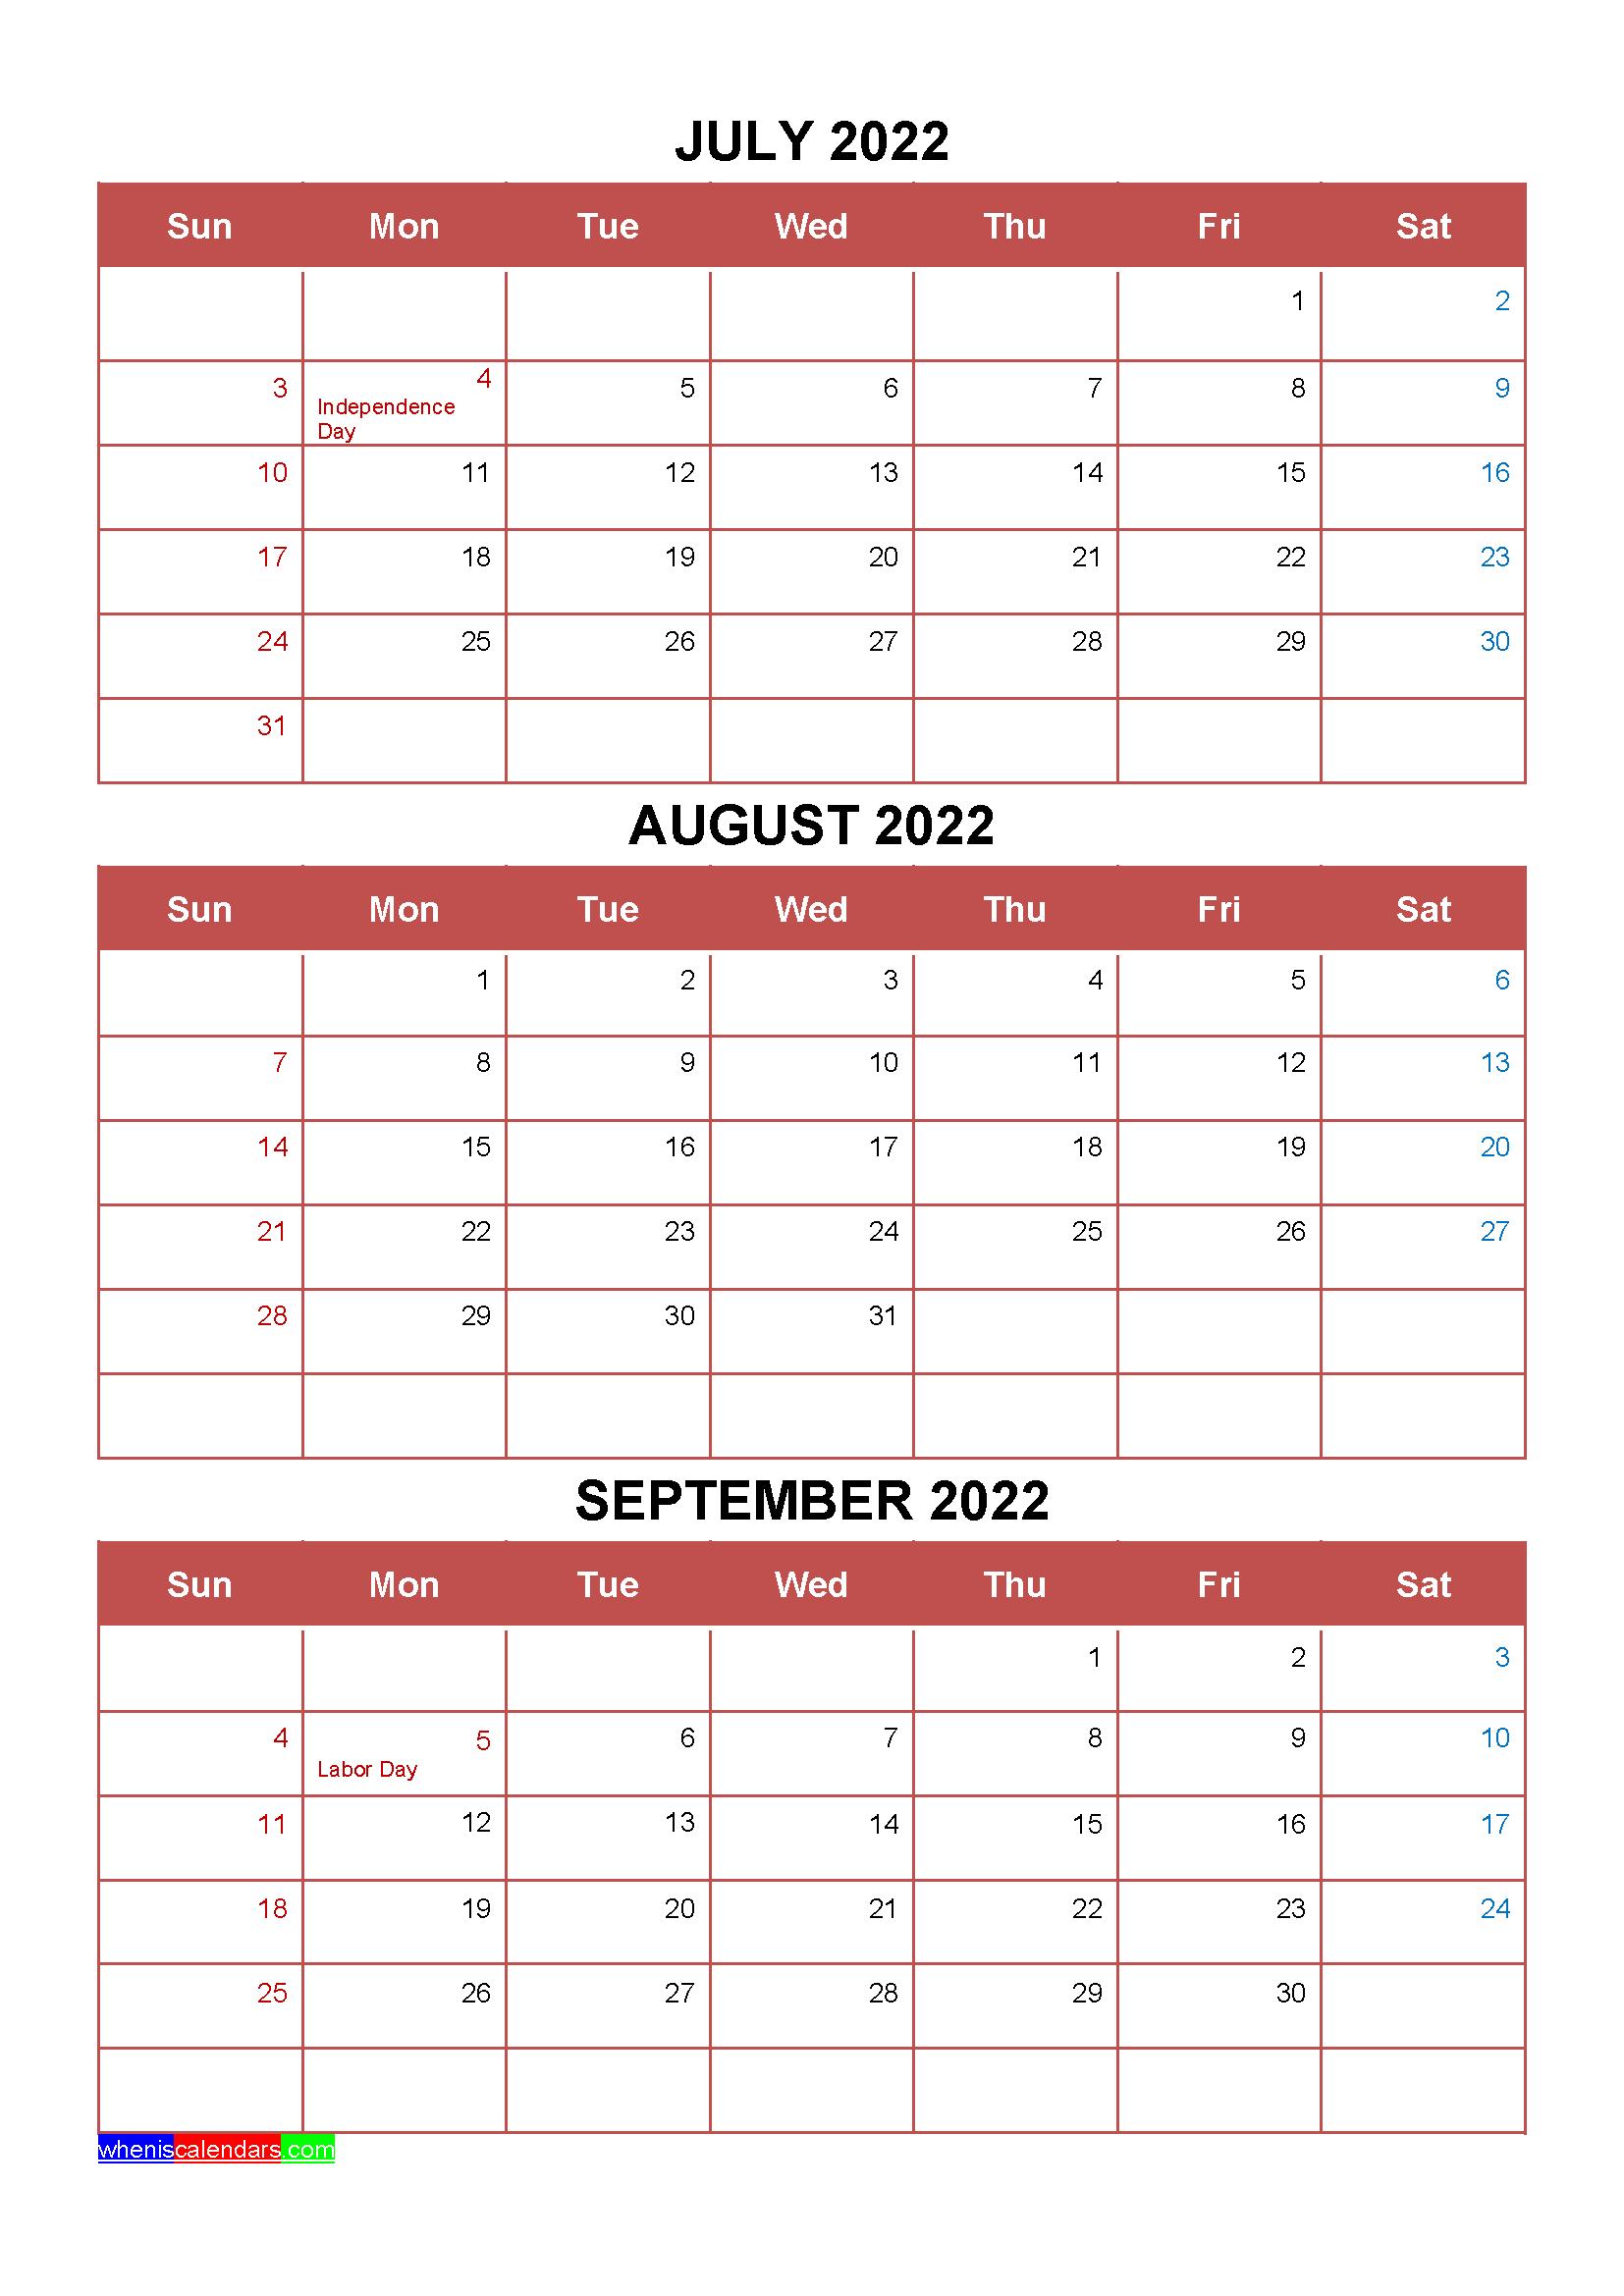 Free Printable Calendar October 2022.Free July August September 2022 Calendar With Holidays Four Quarters Calendar Printables Free Printable Calendar Templates Calendar Template